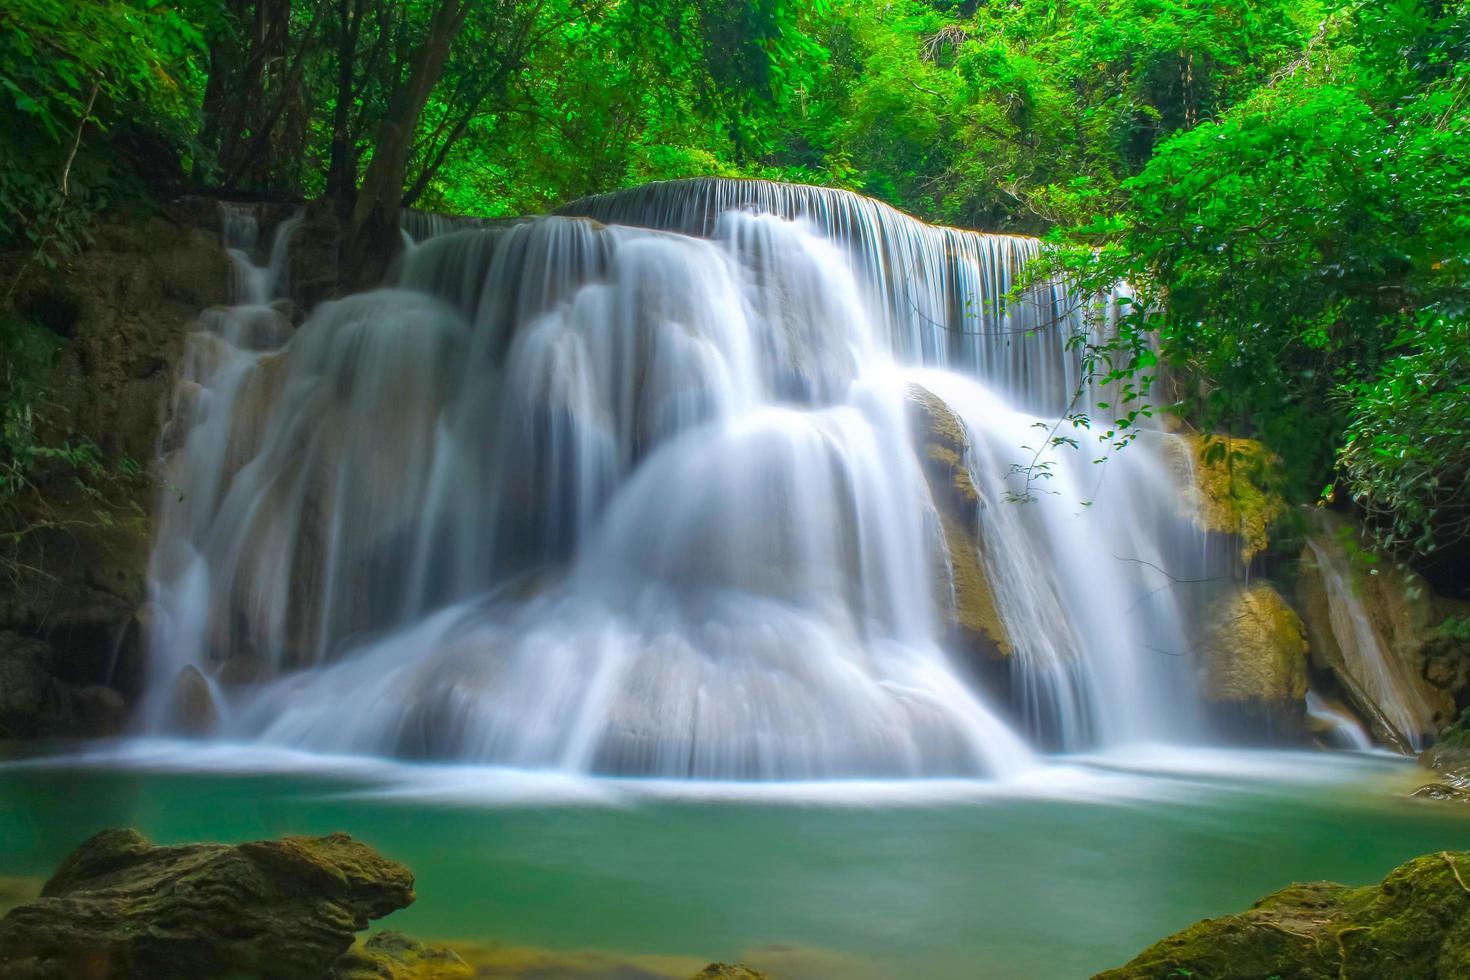 Beautiful waterfall in a rainforest photo